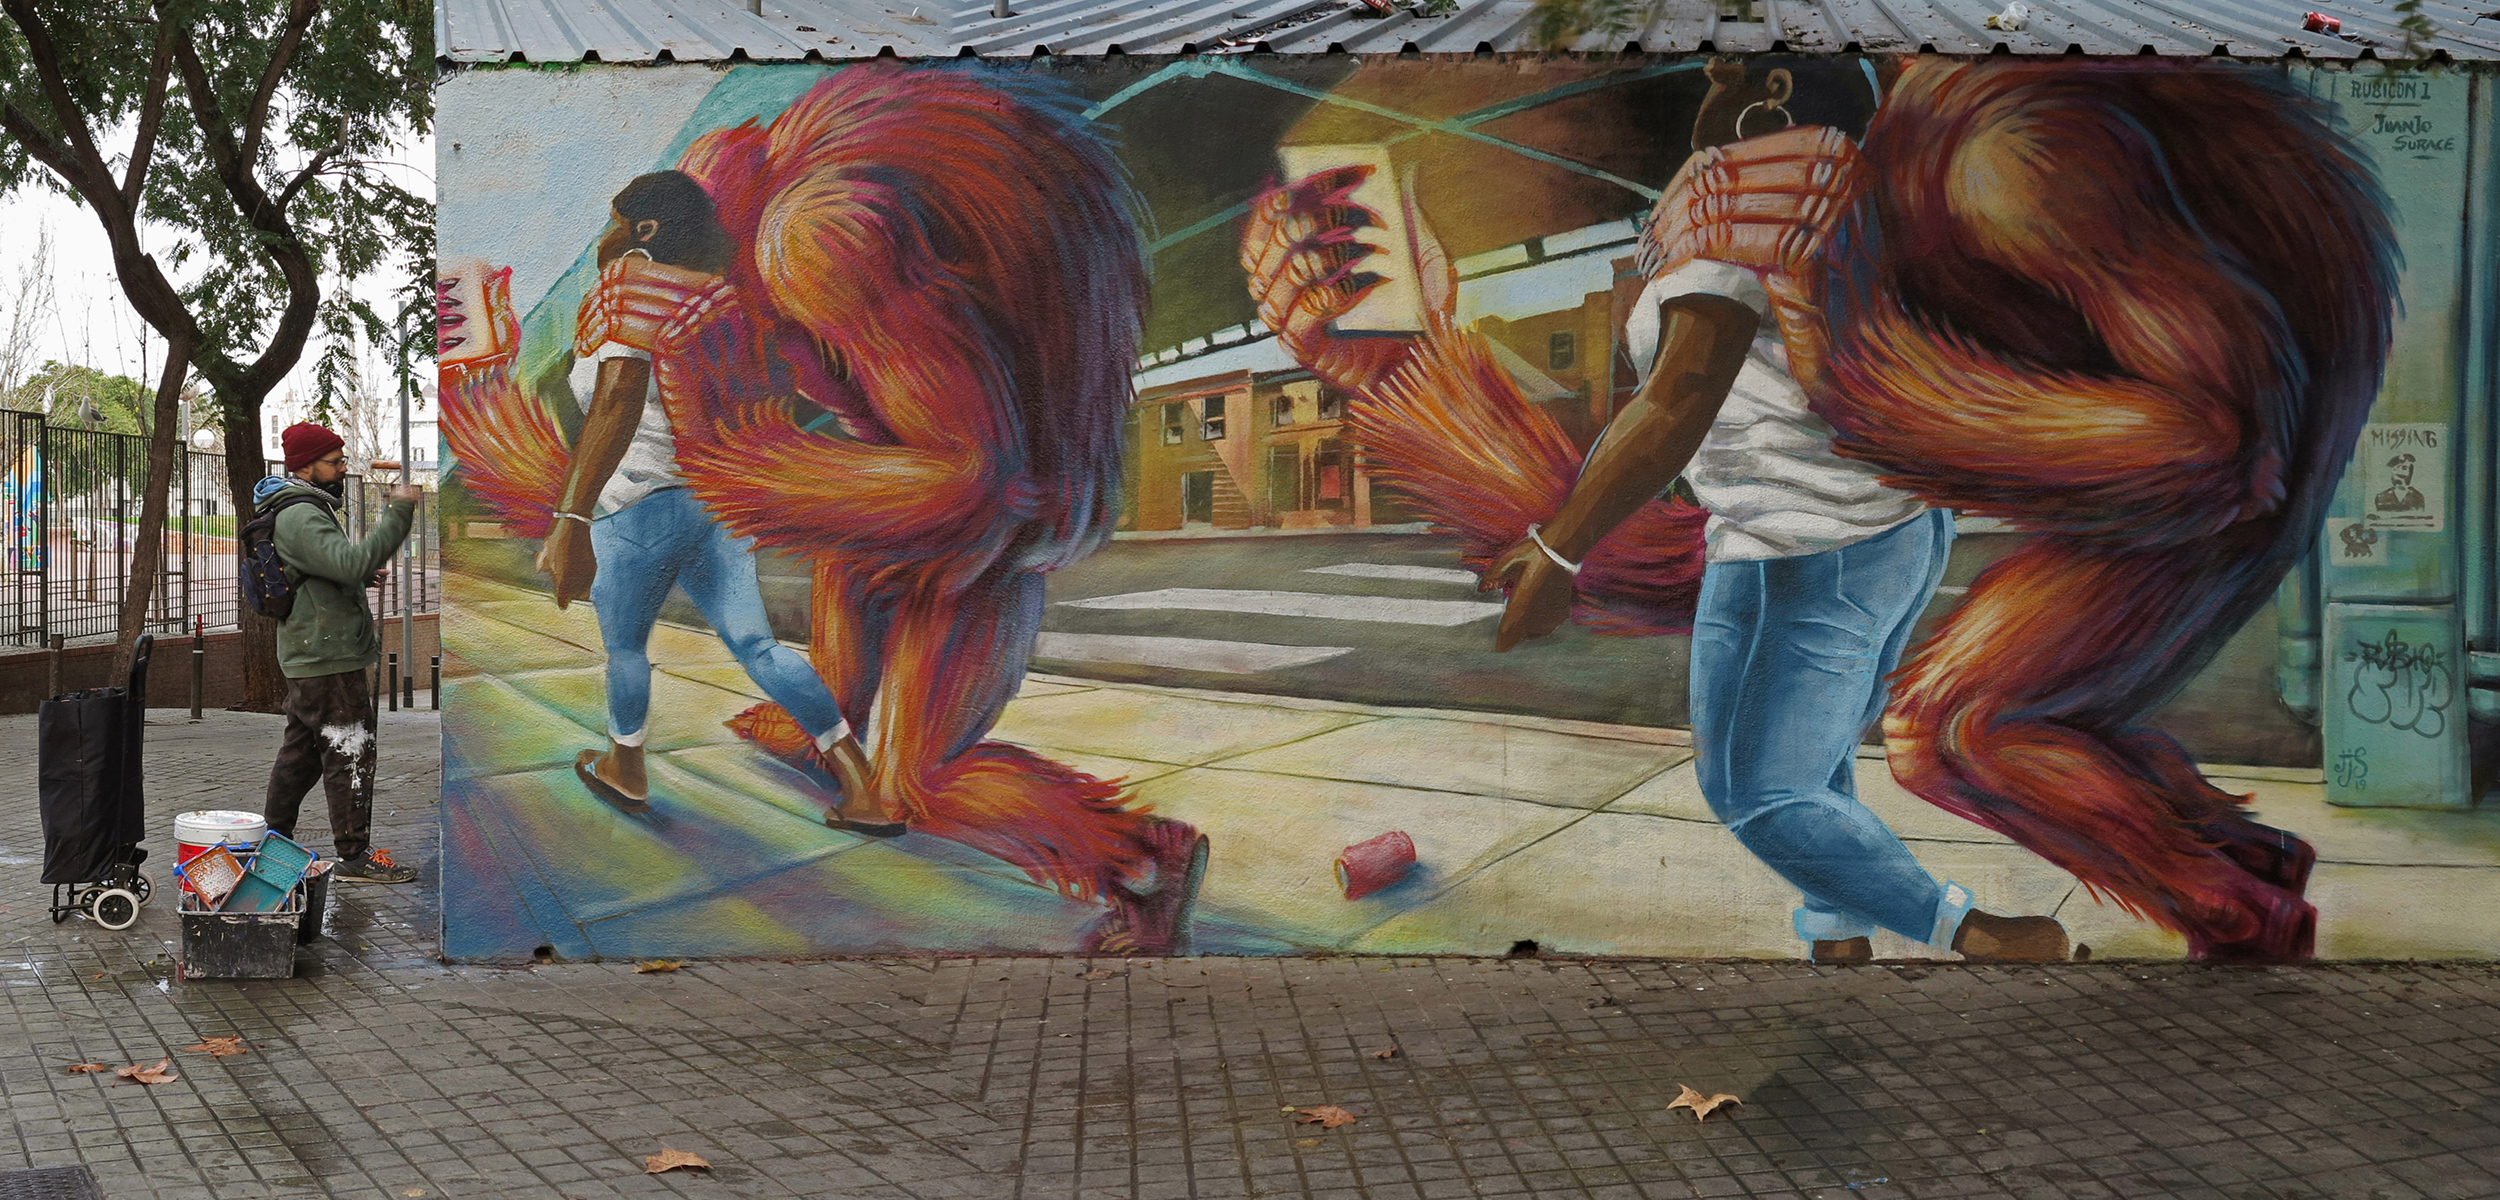 Arte urbano Juanjo Surace & Ru8icon1 Barcelona